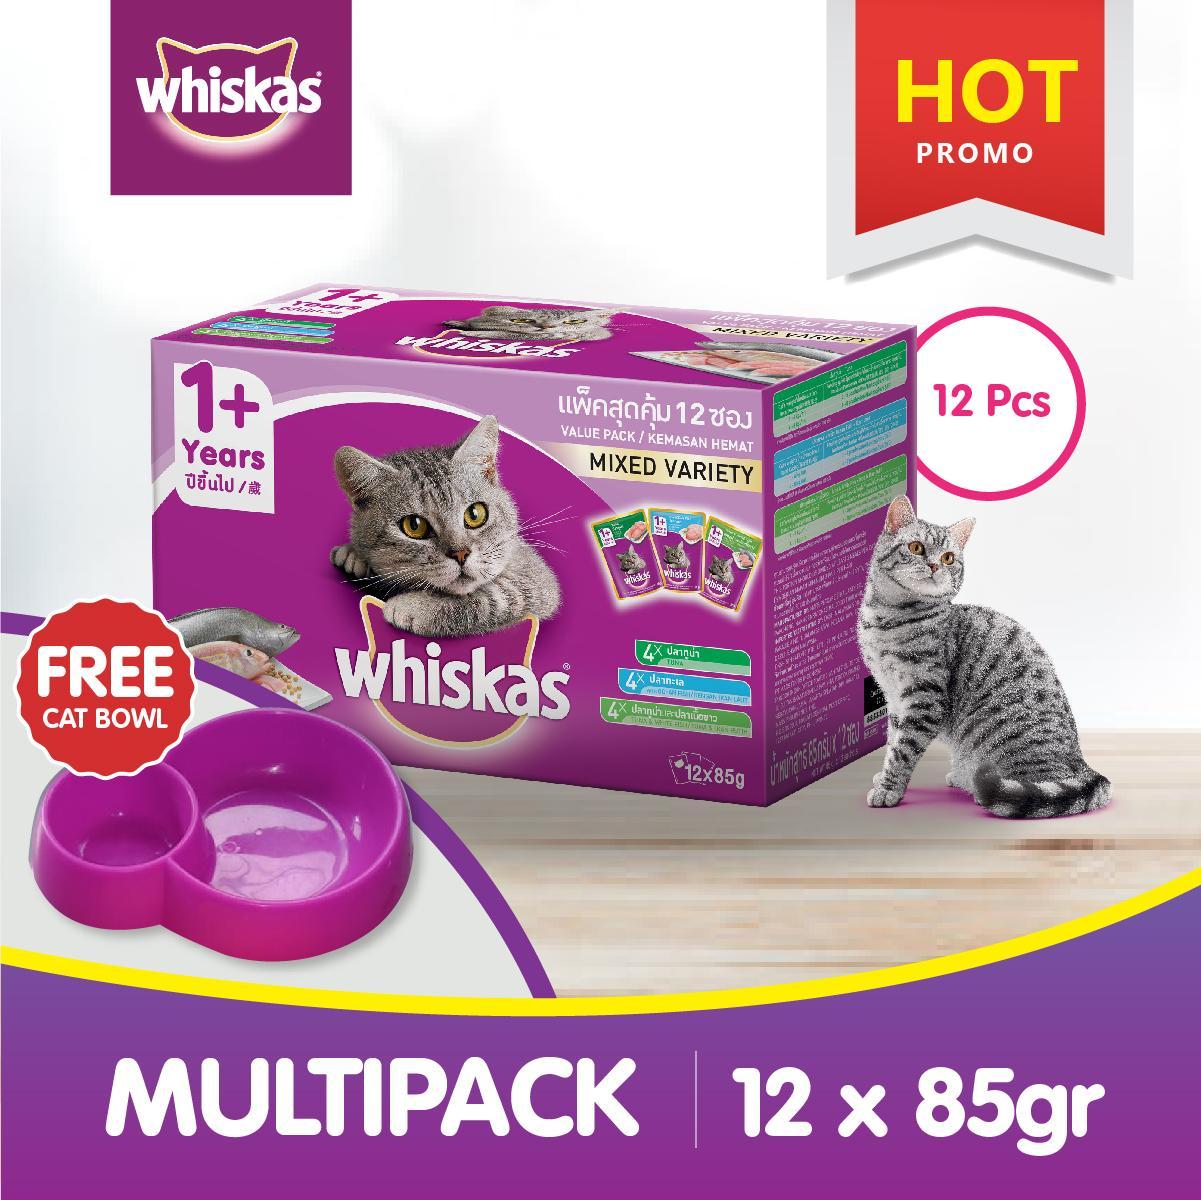 Makanan Kucing Terbaik Whiskas Dry 480gr Kering Rasa Chicken Isi 12 Pack Pouch 85 Gr Basah Mackerel Ocean